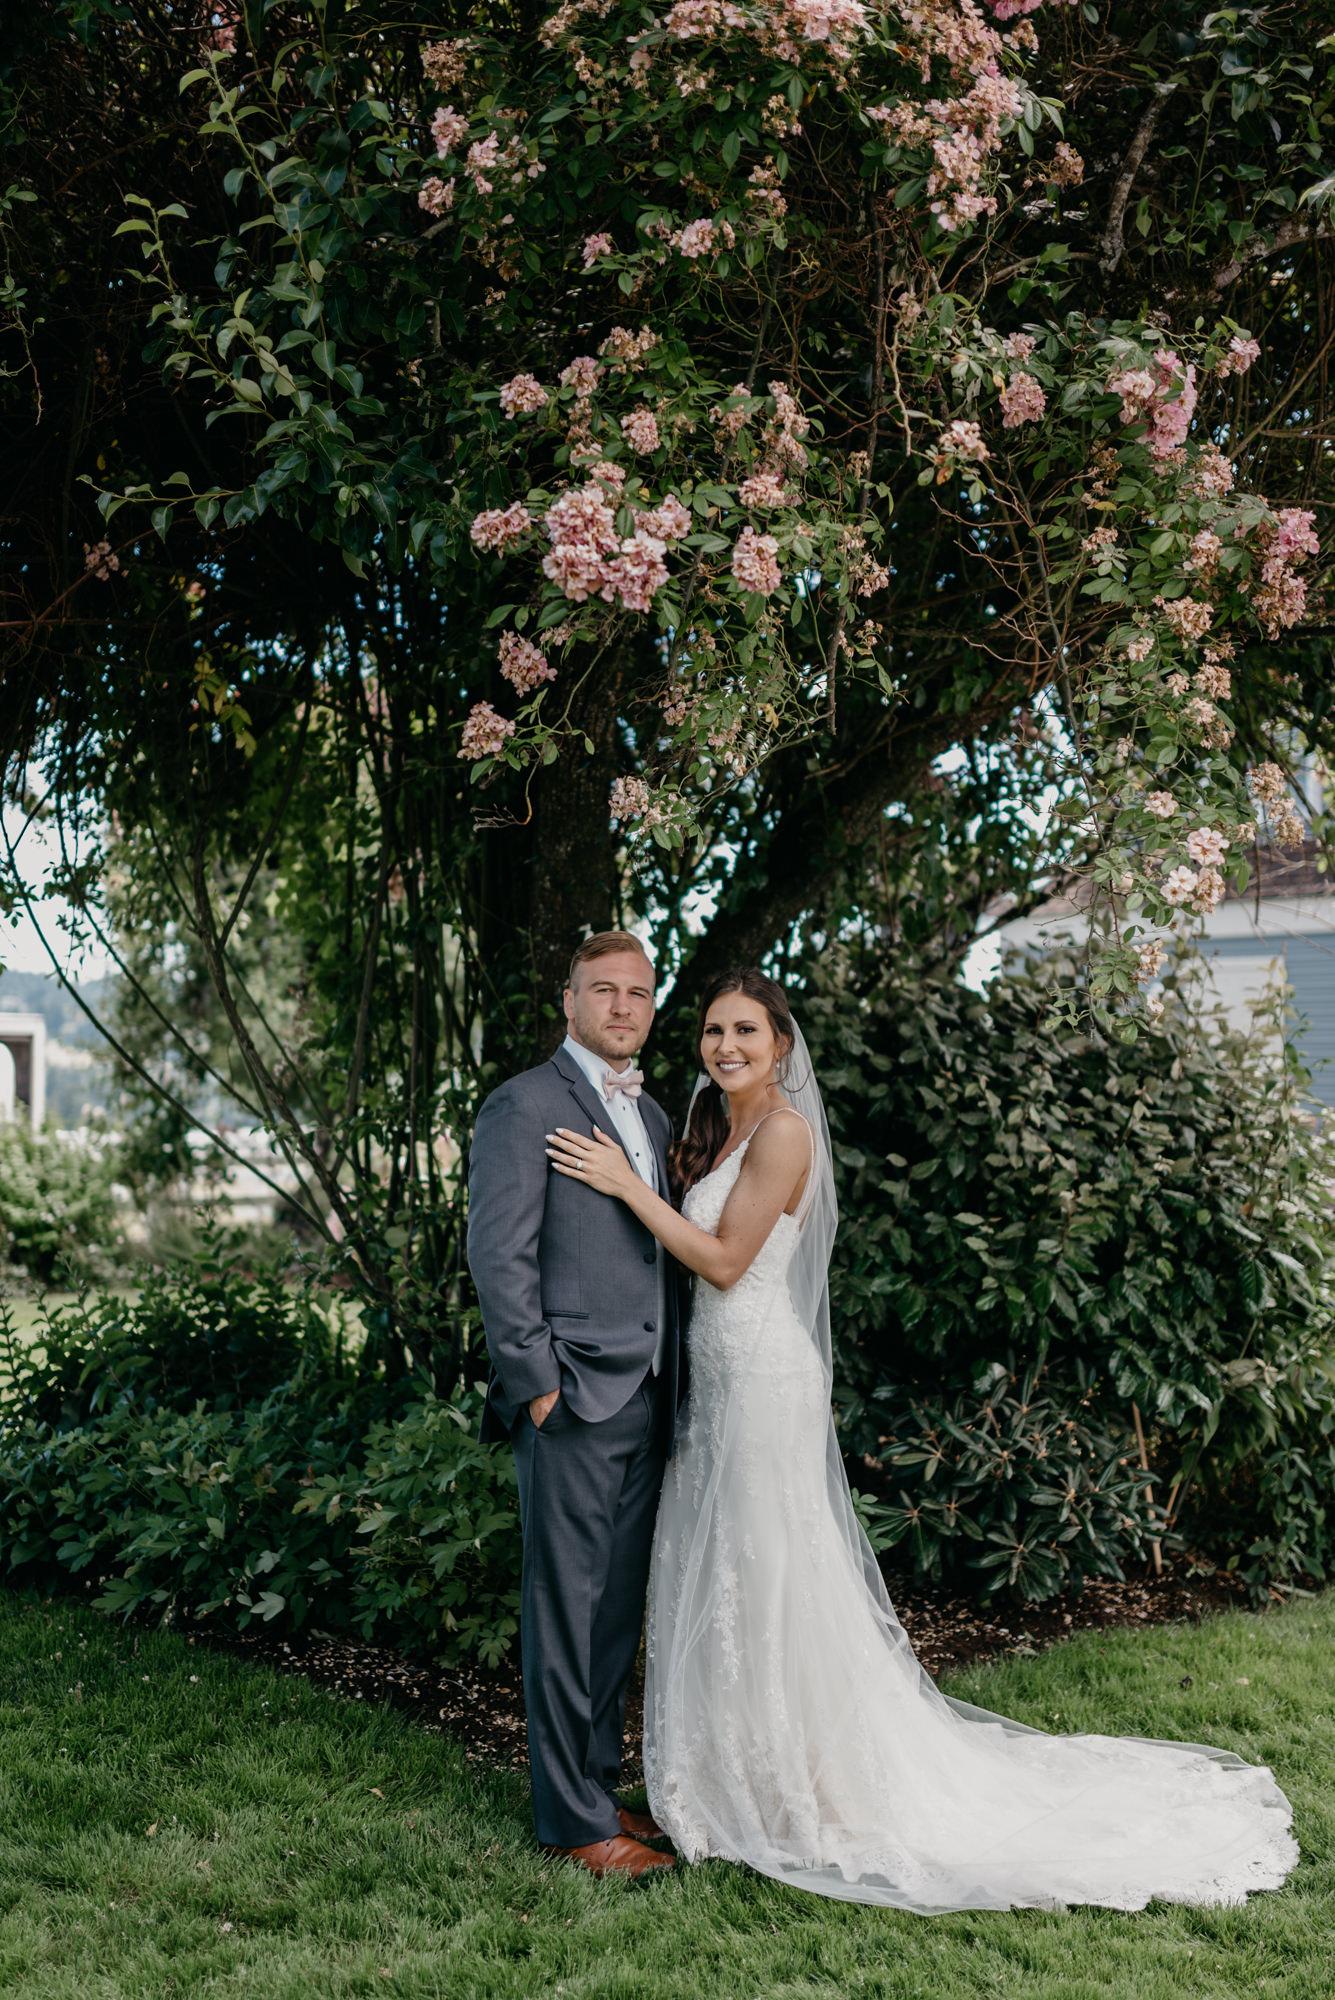 38-lake-oswego-wedding-portland-couple-rose-tree.jpg